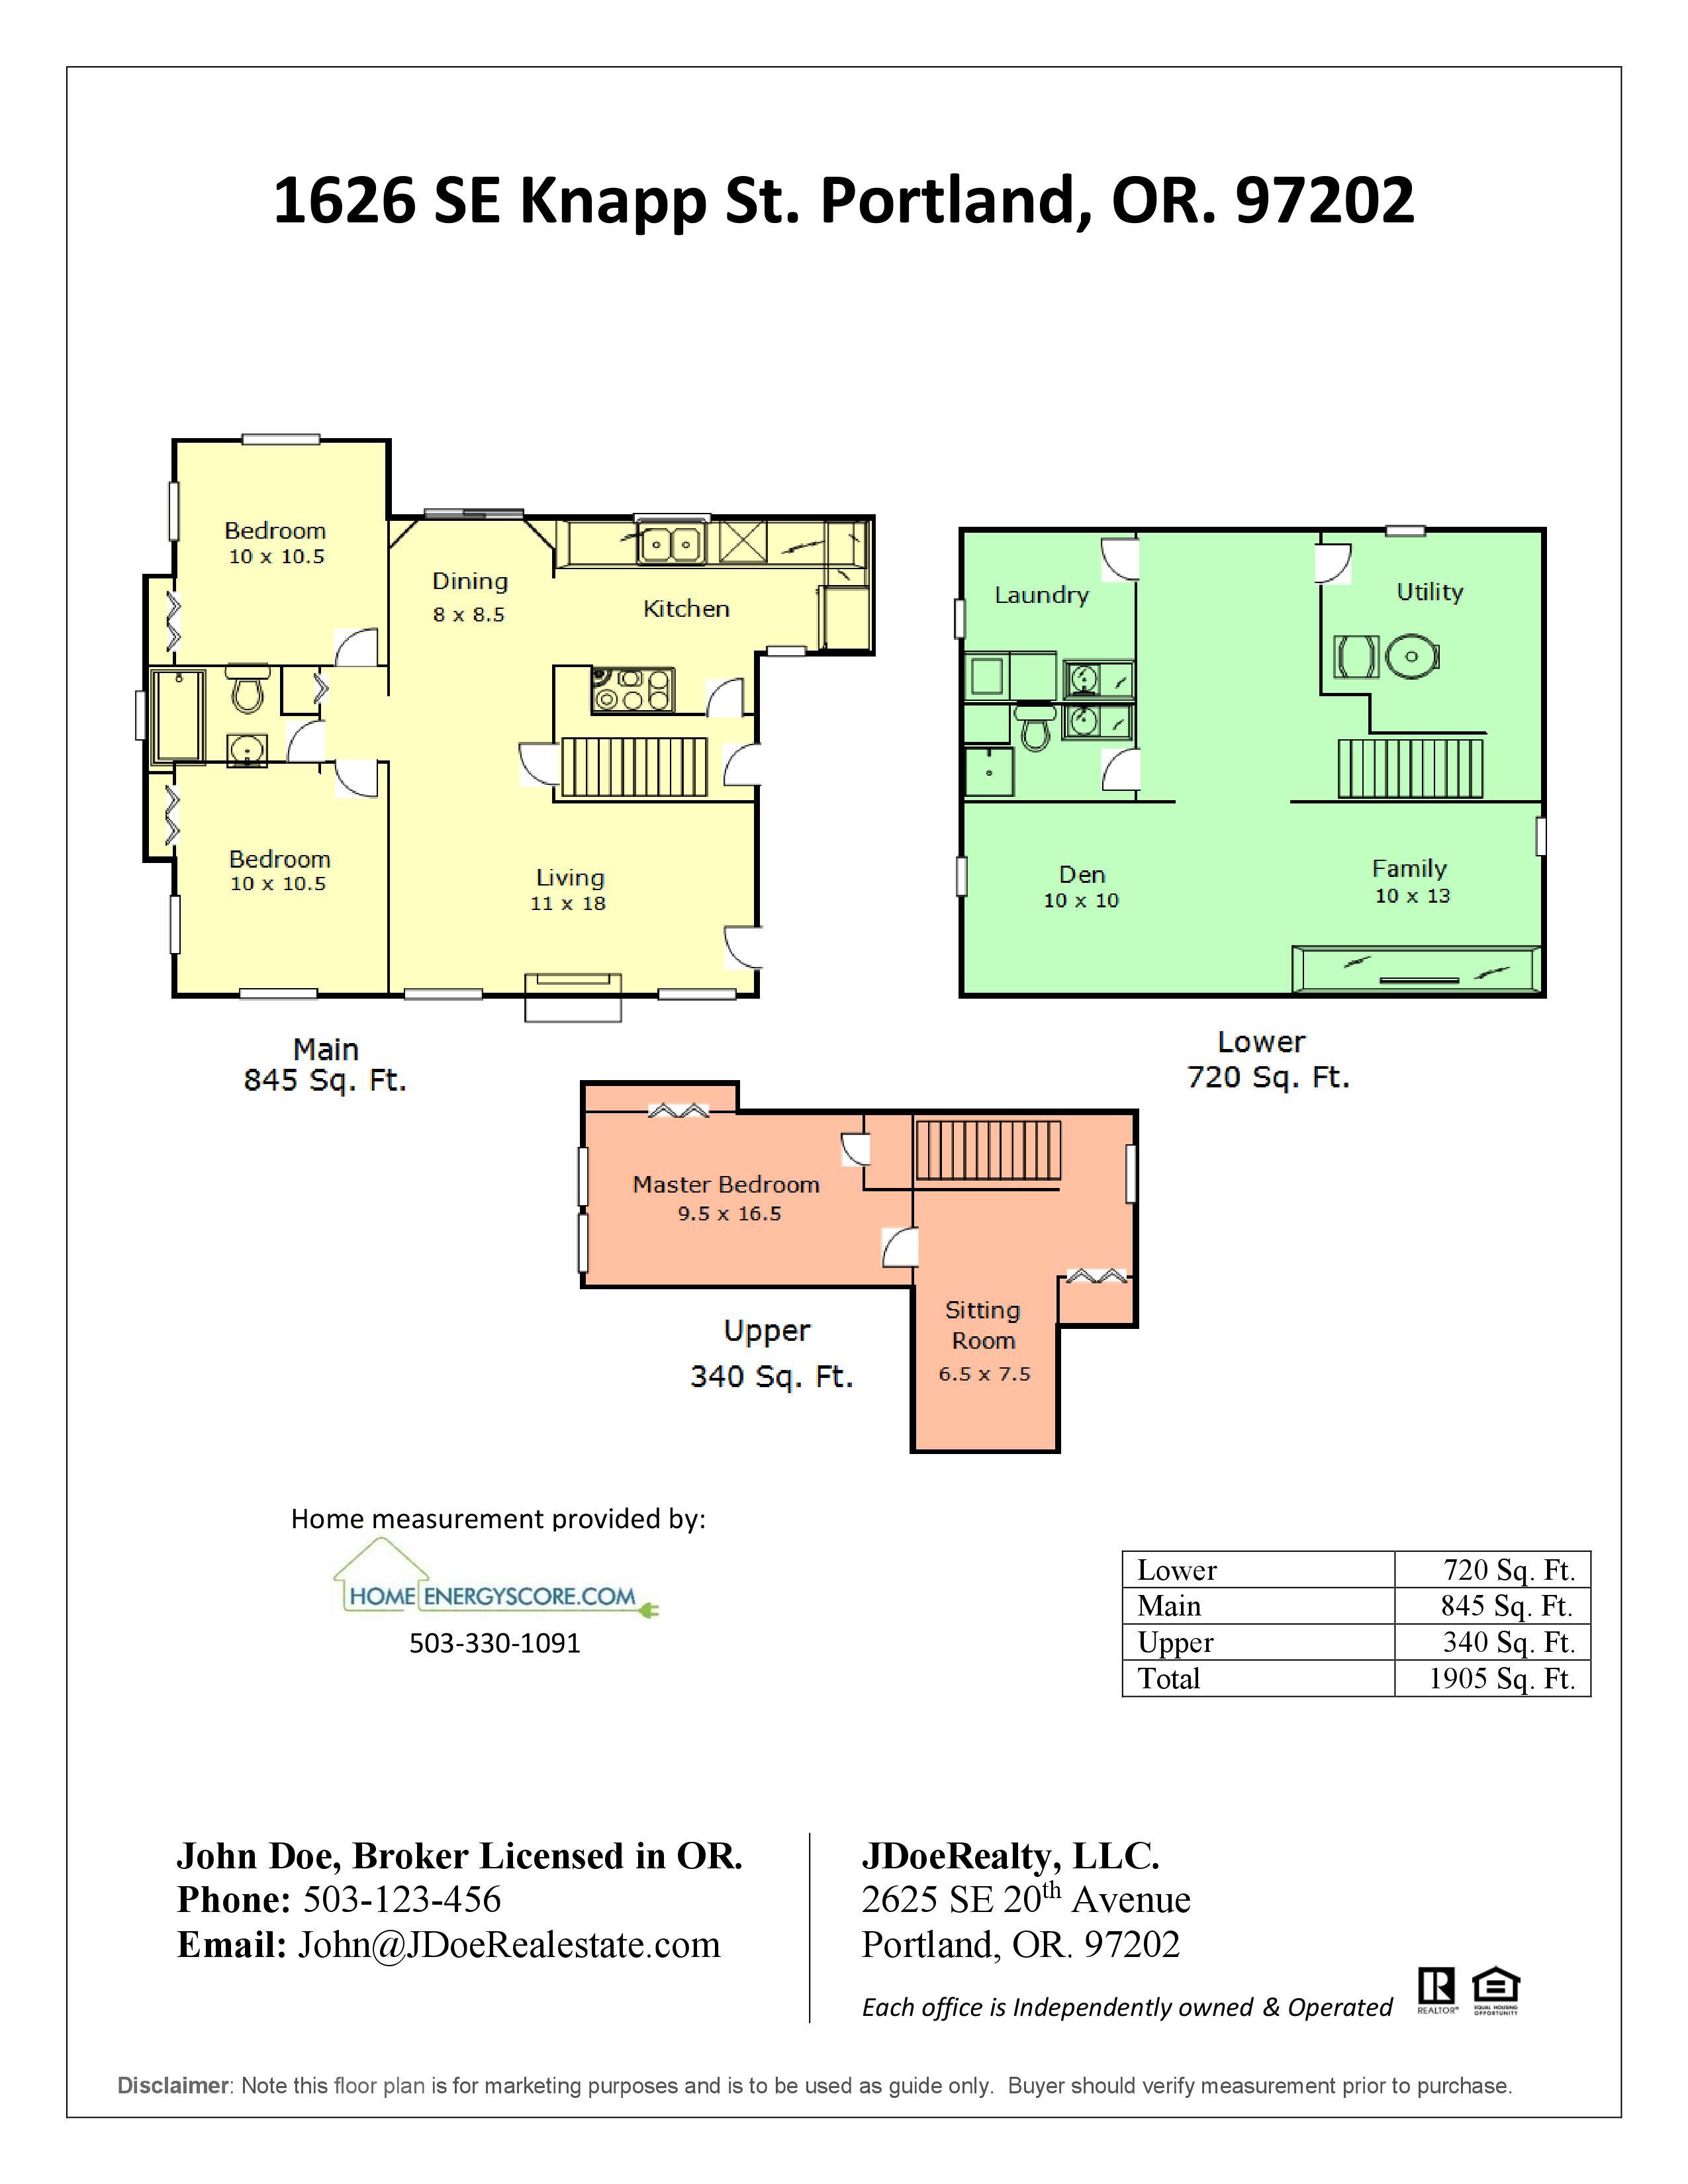 Floor Plans Home Energy Score